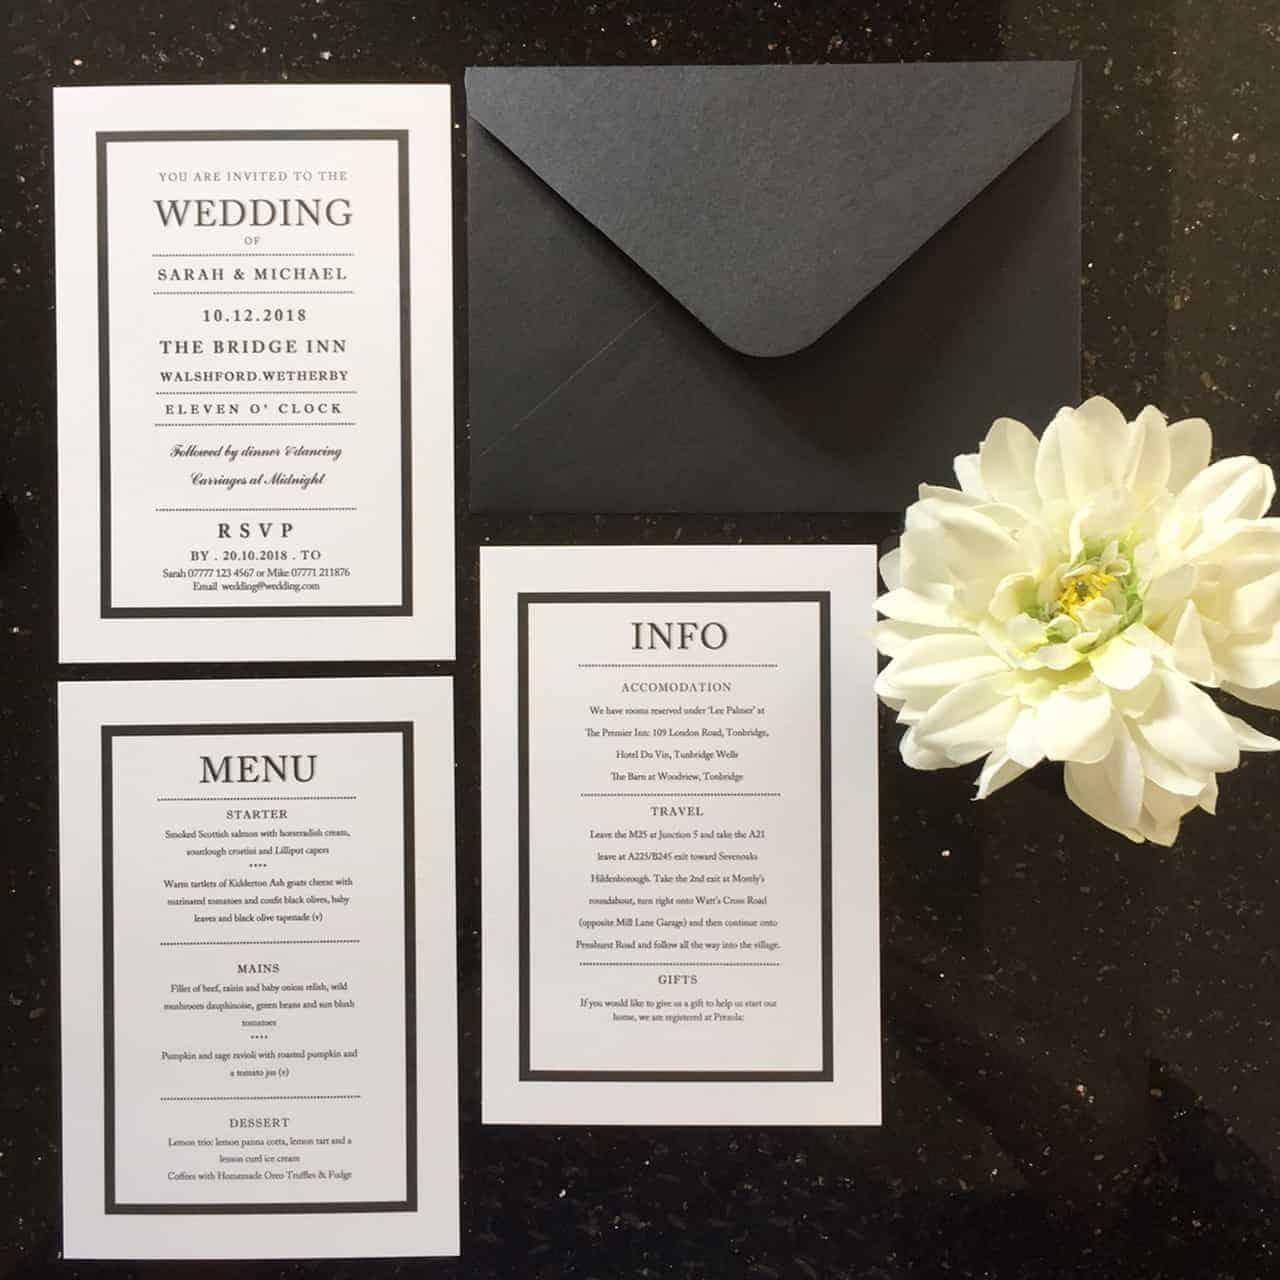 Black White Wedding Invitations: Black And White Wedding Invitations And Stationery